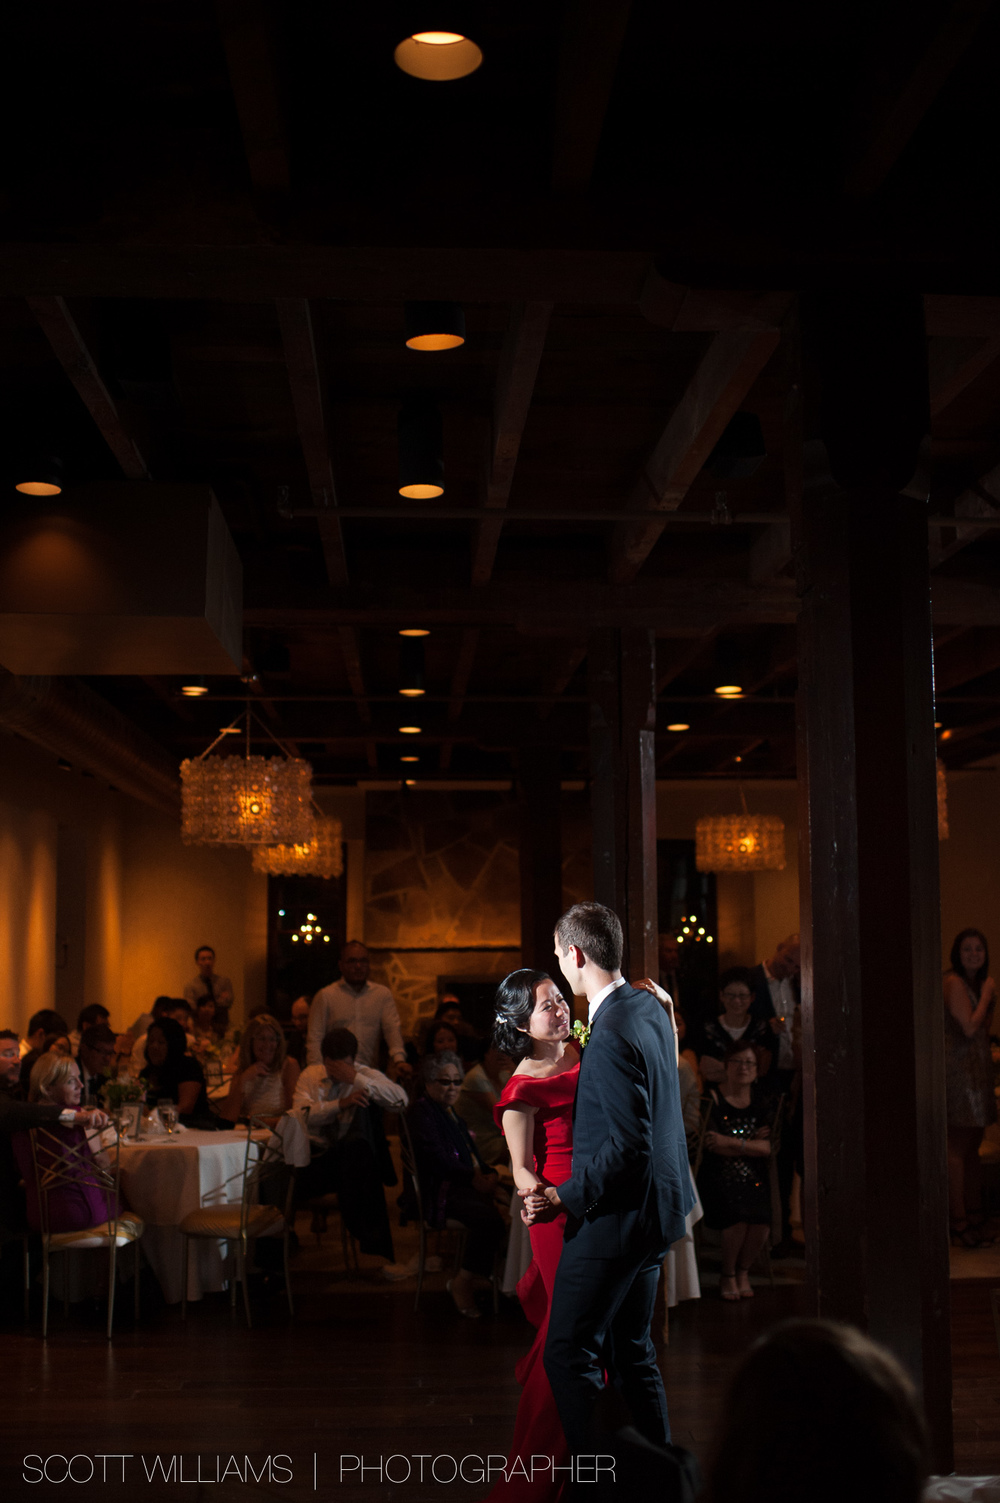 ancaster-mill-wedding-photograph-009.jpg